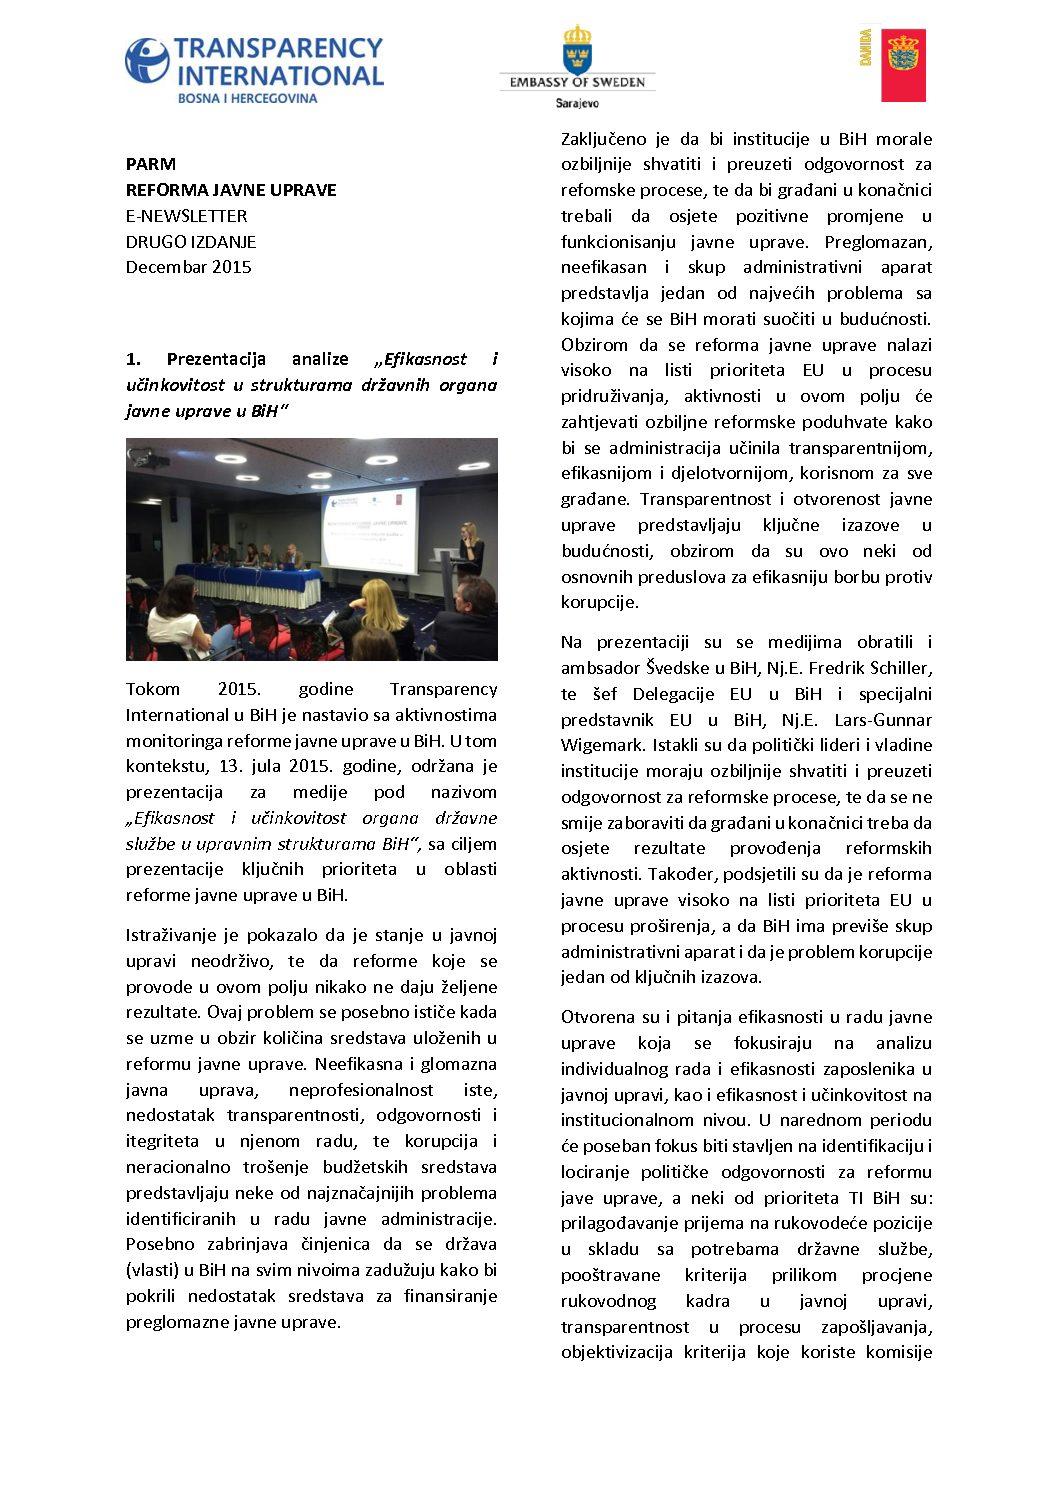 PARM Newsletter II